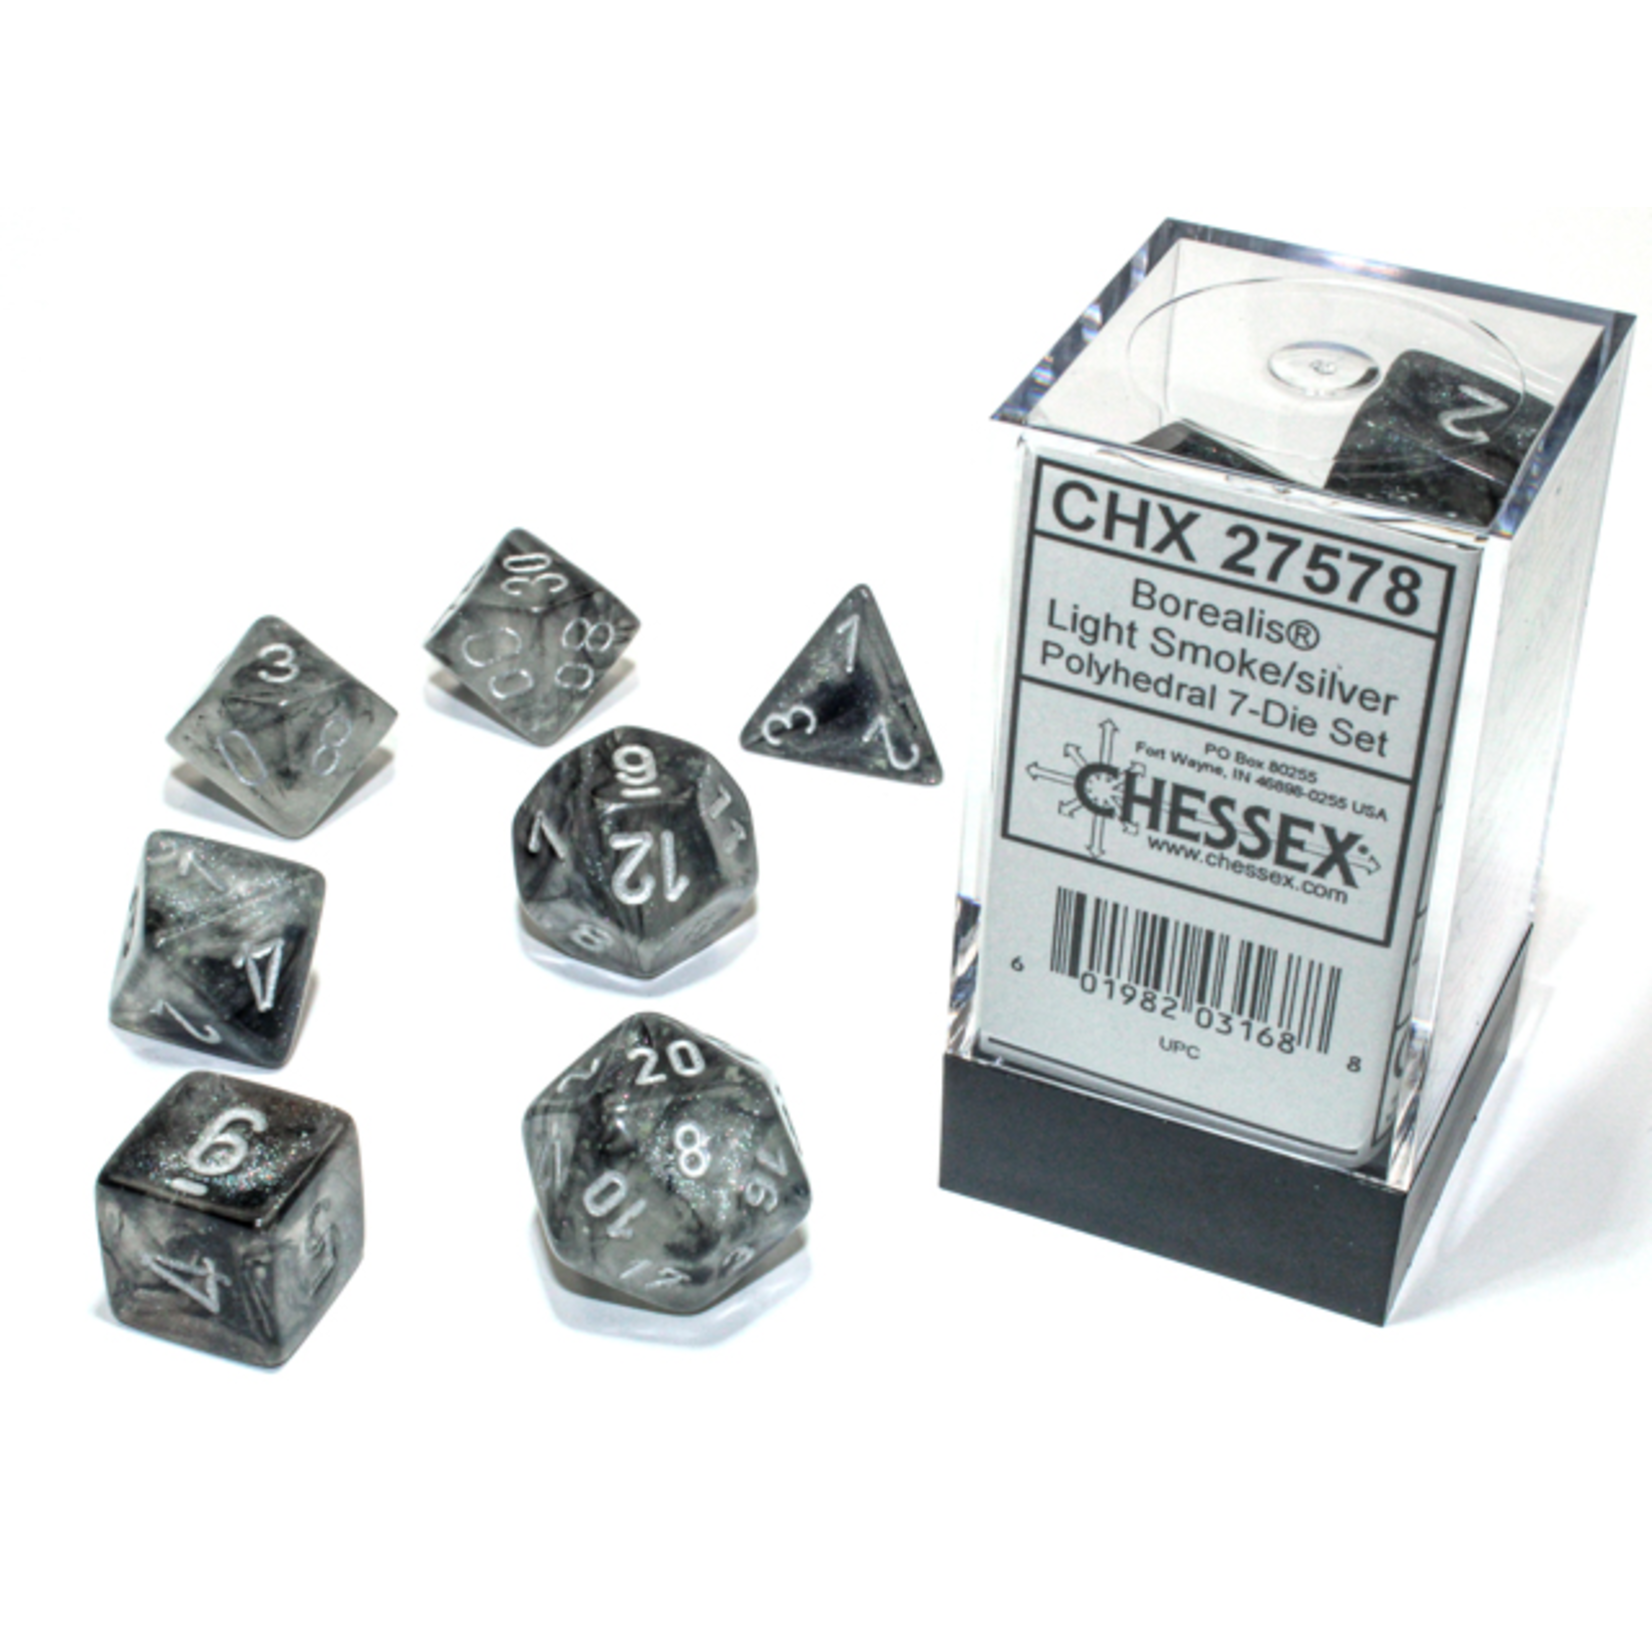 Chessex Dice: 7-Set Borealis Luminary Light Smoke with Silver (CHX)